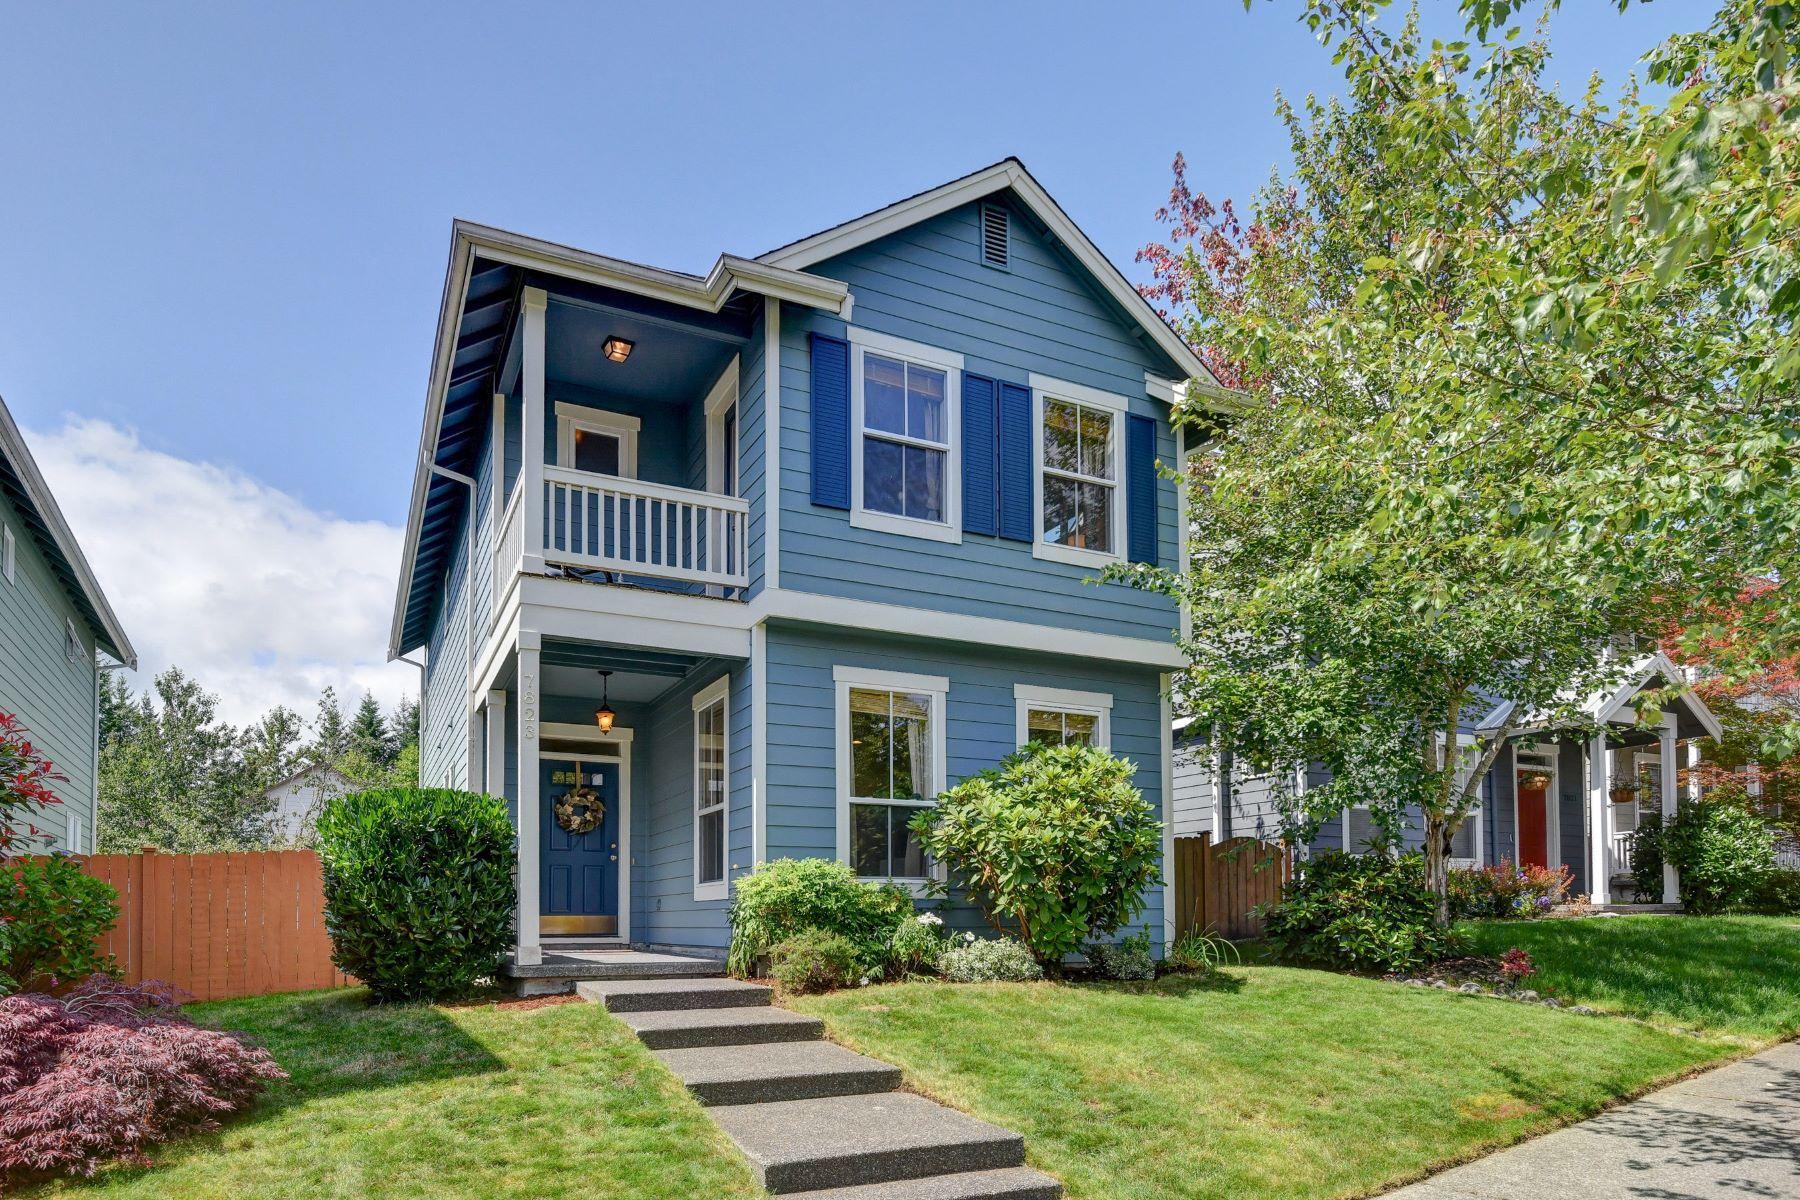 Single Family Homes for Sale at Delightful Snoqualmie Ridge Living 7823 Ingram Ln SE Snoqualmie, Washington 98065 United States